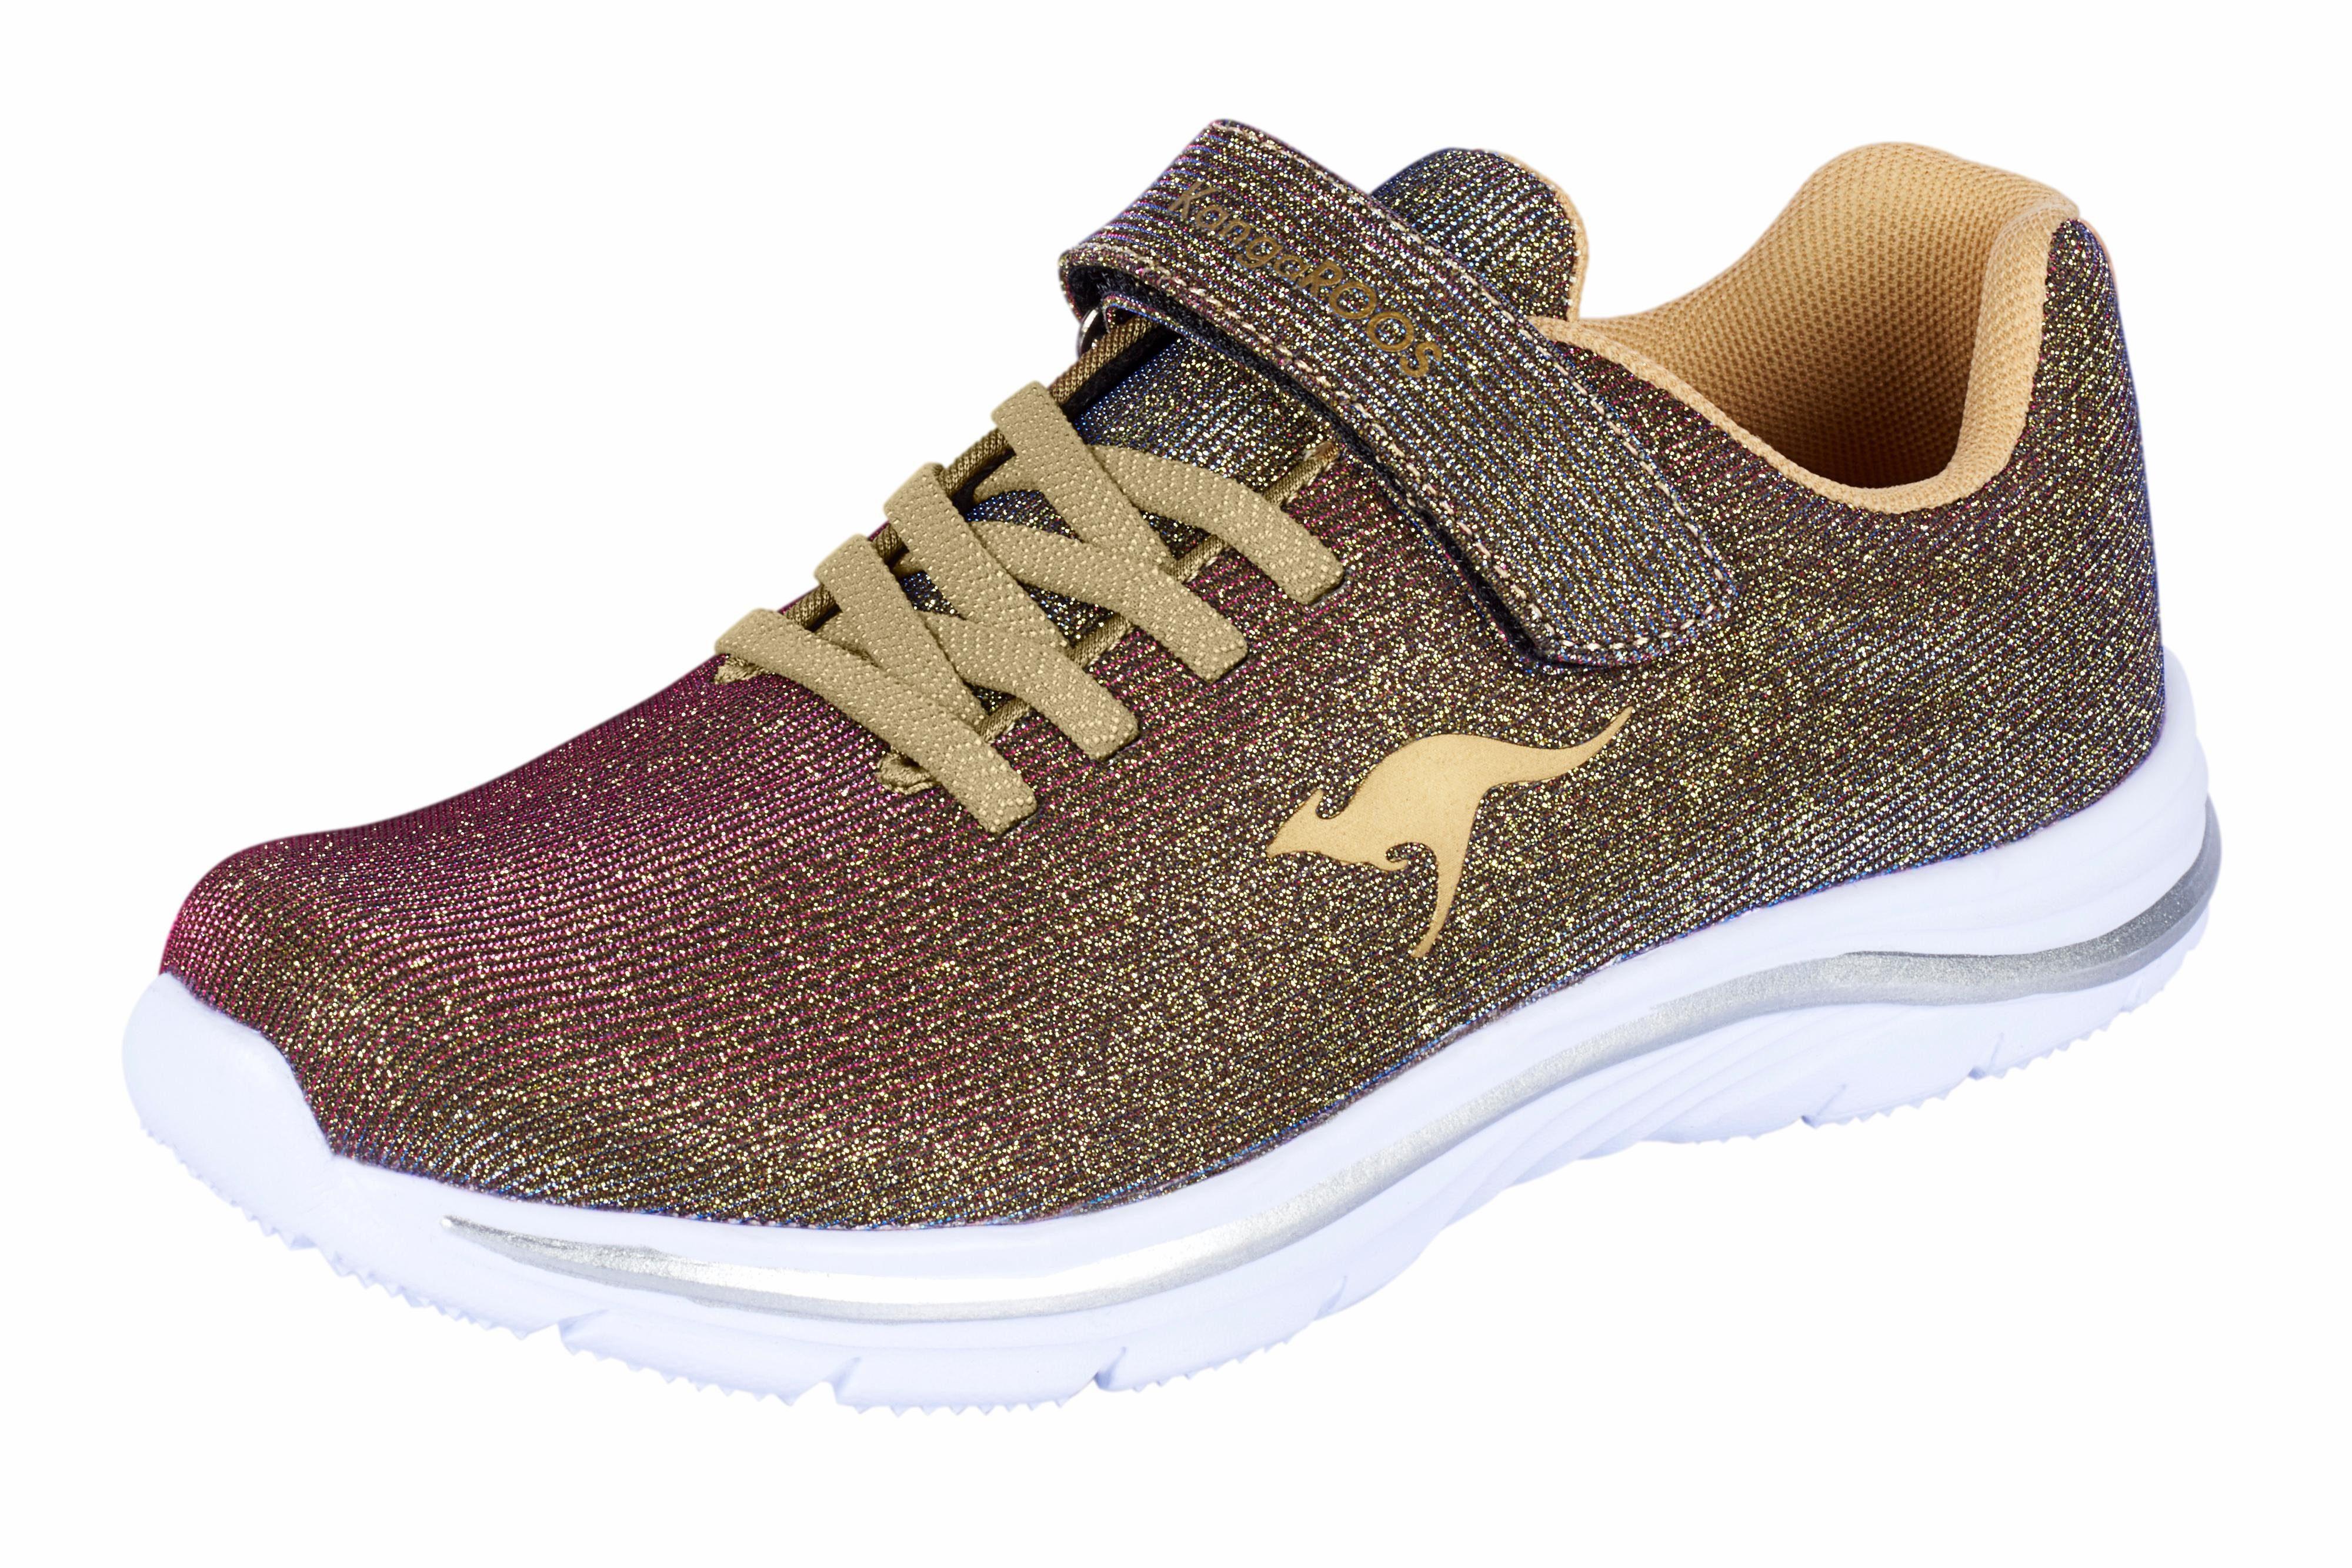 KangaROOS Sneaker , changierend online kaufen  goldfarben#ft5_slash#bunt